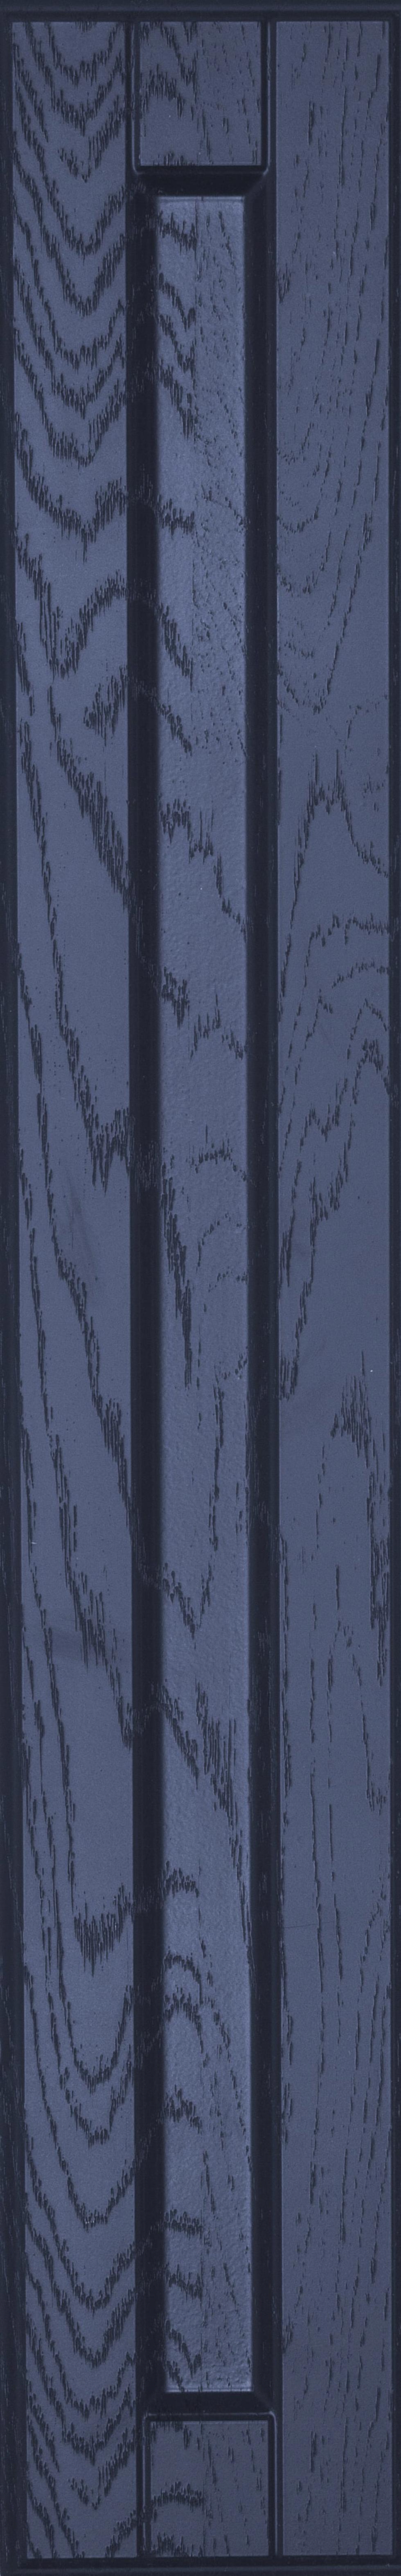 Дверь для шкафа «Антея» 15х92 см